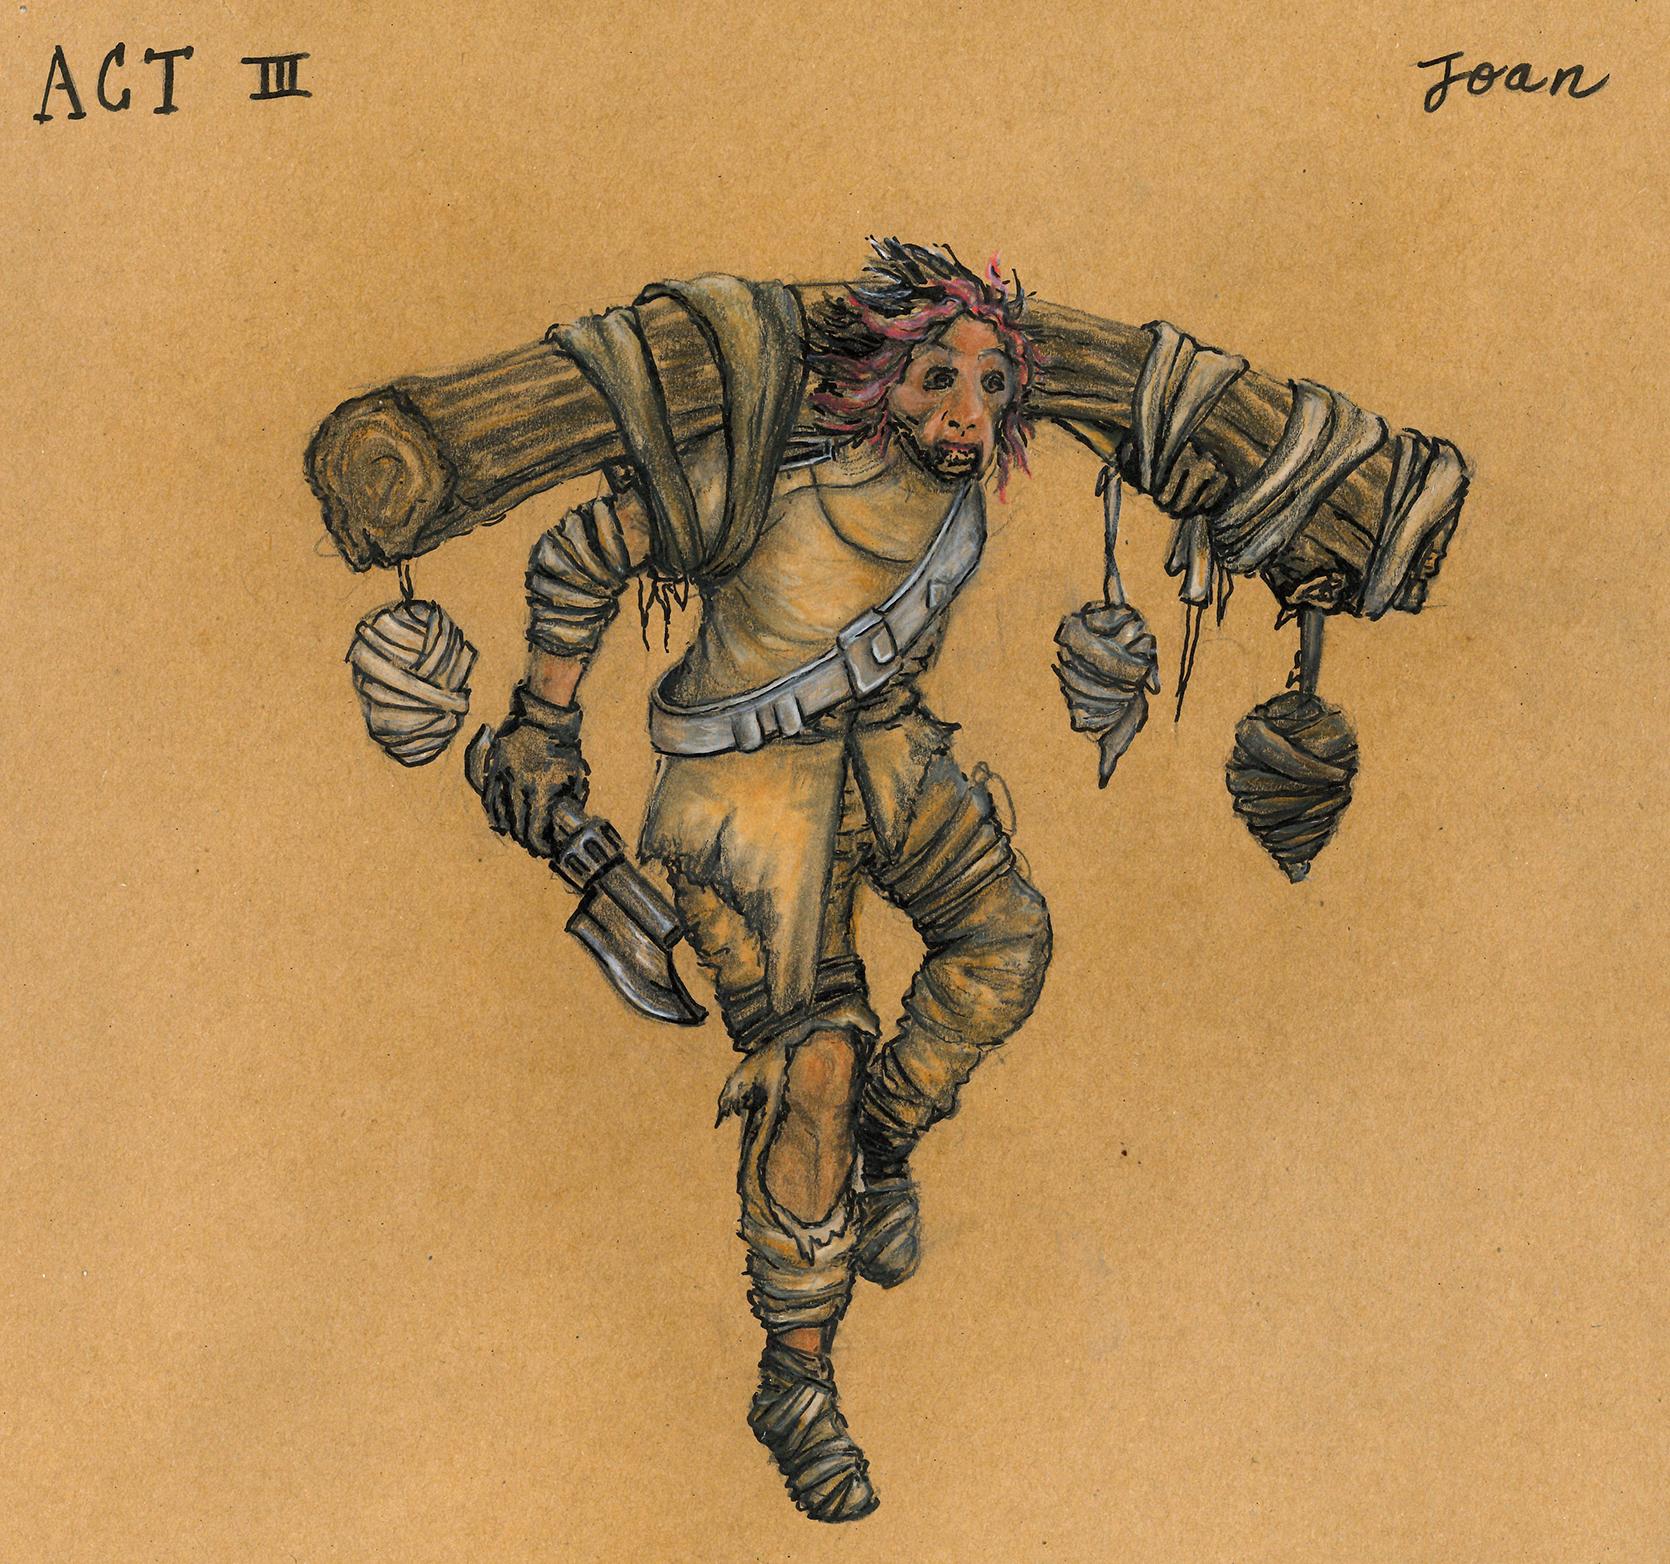 act3_joan